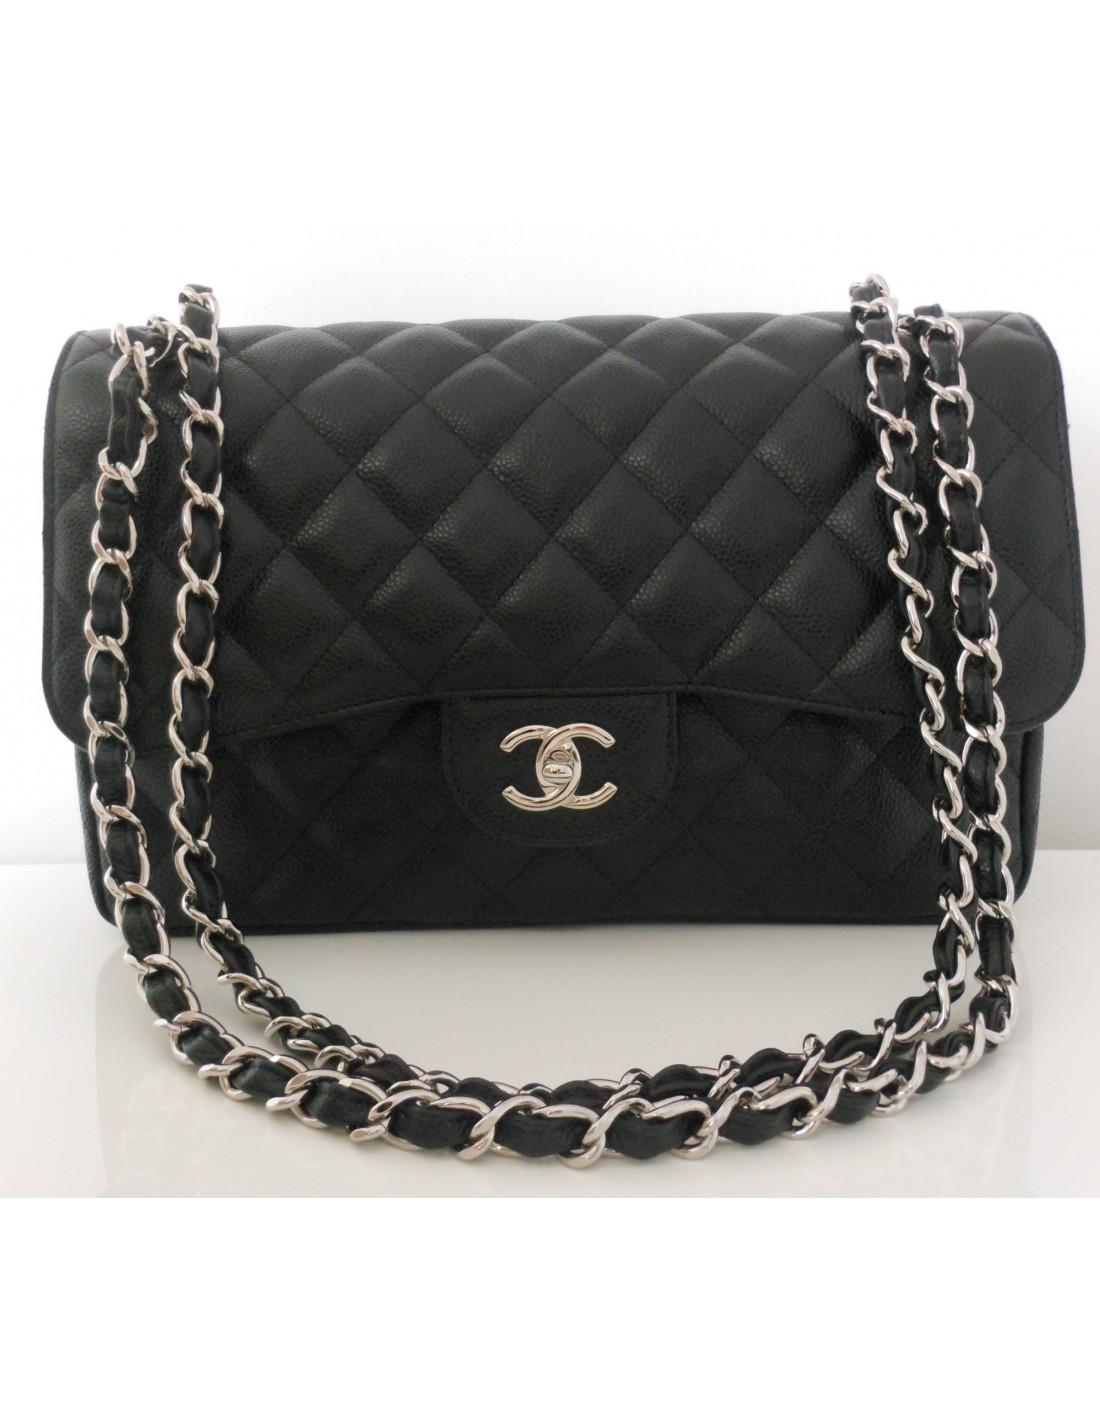 chanel sac noir